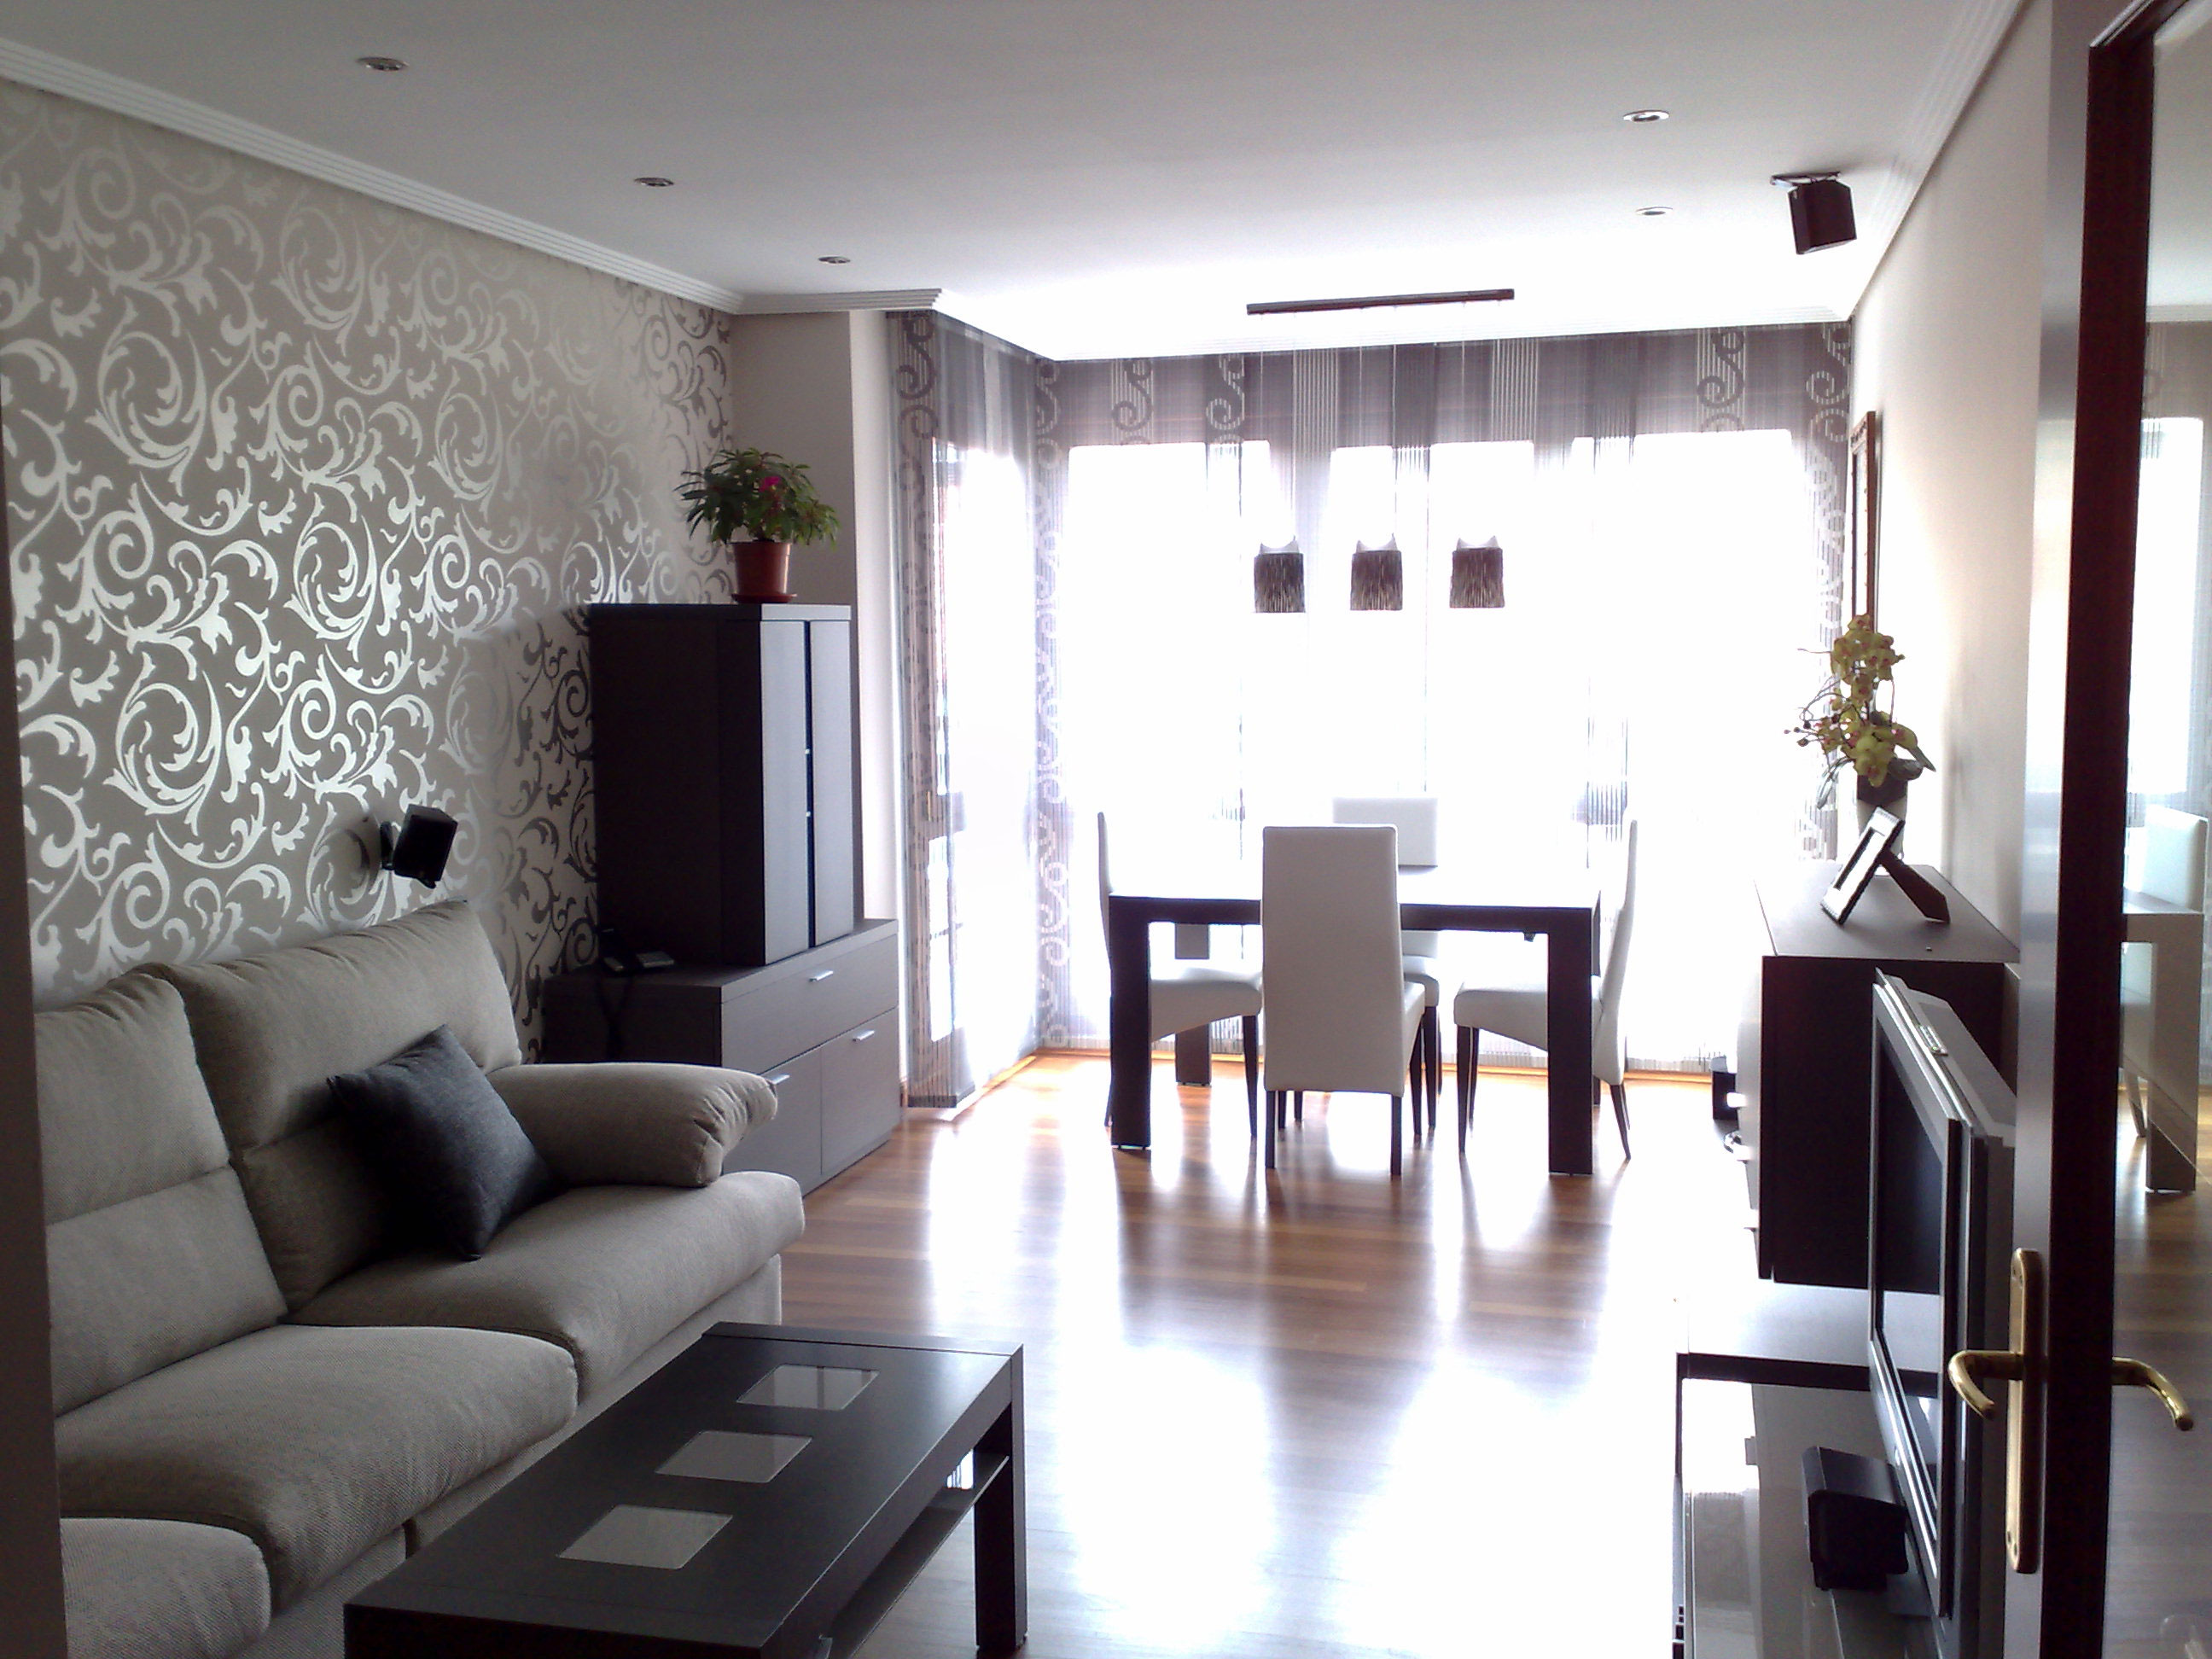 Decoracion sala comedor moderno - Adornos para casas ...